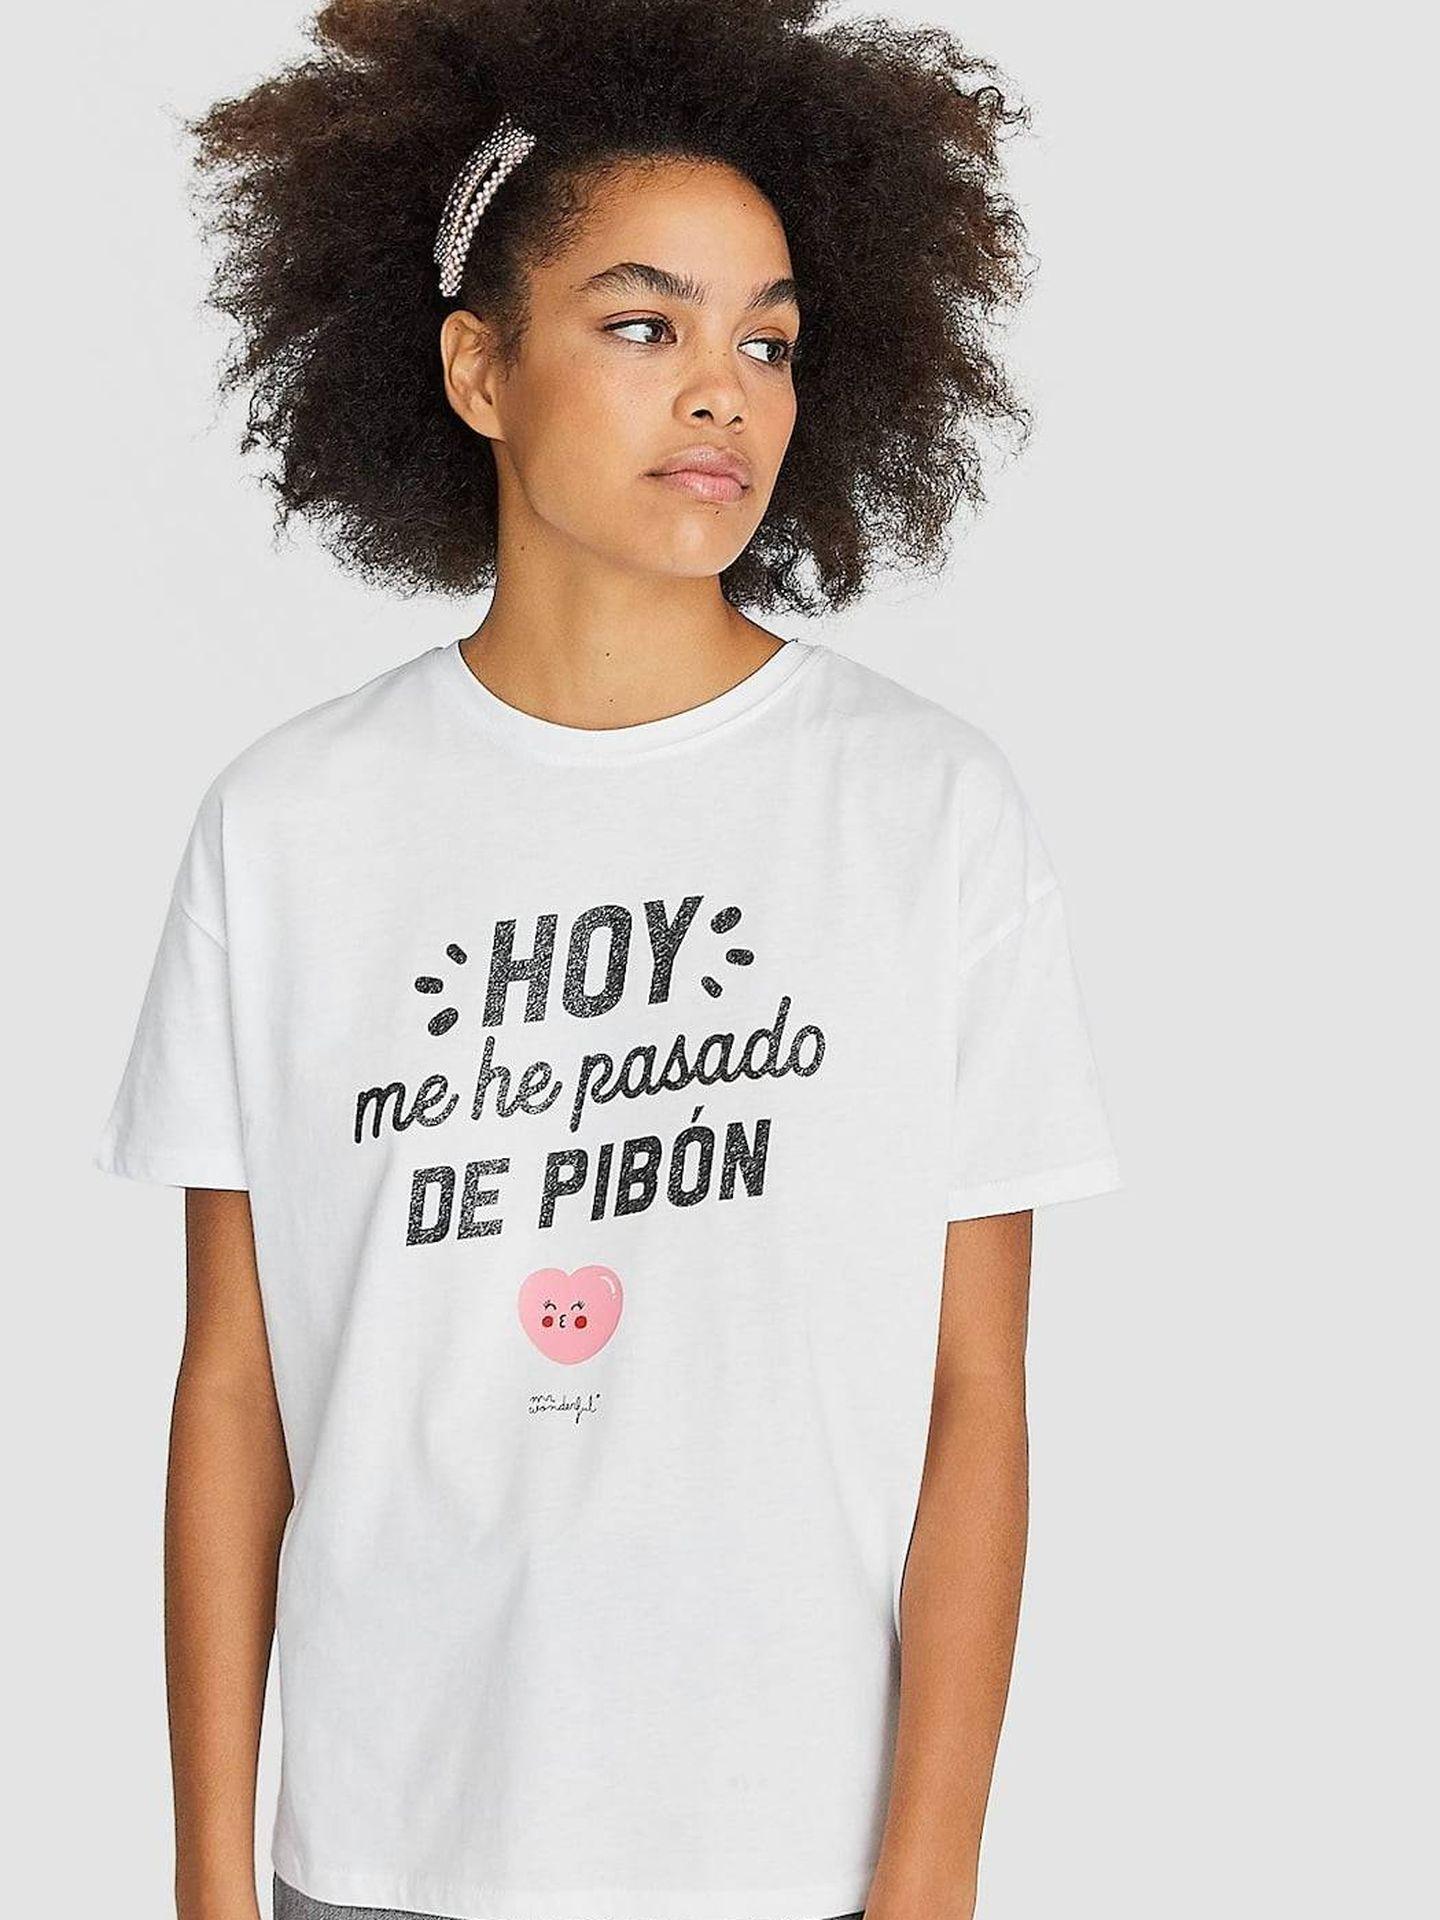 Camiseta Mr Wonderful. (Cortesía)